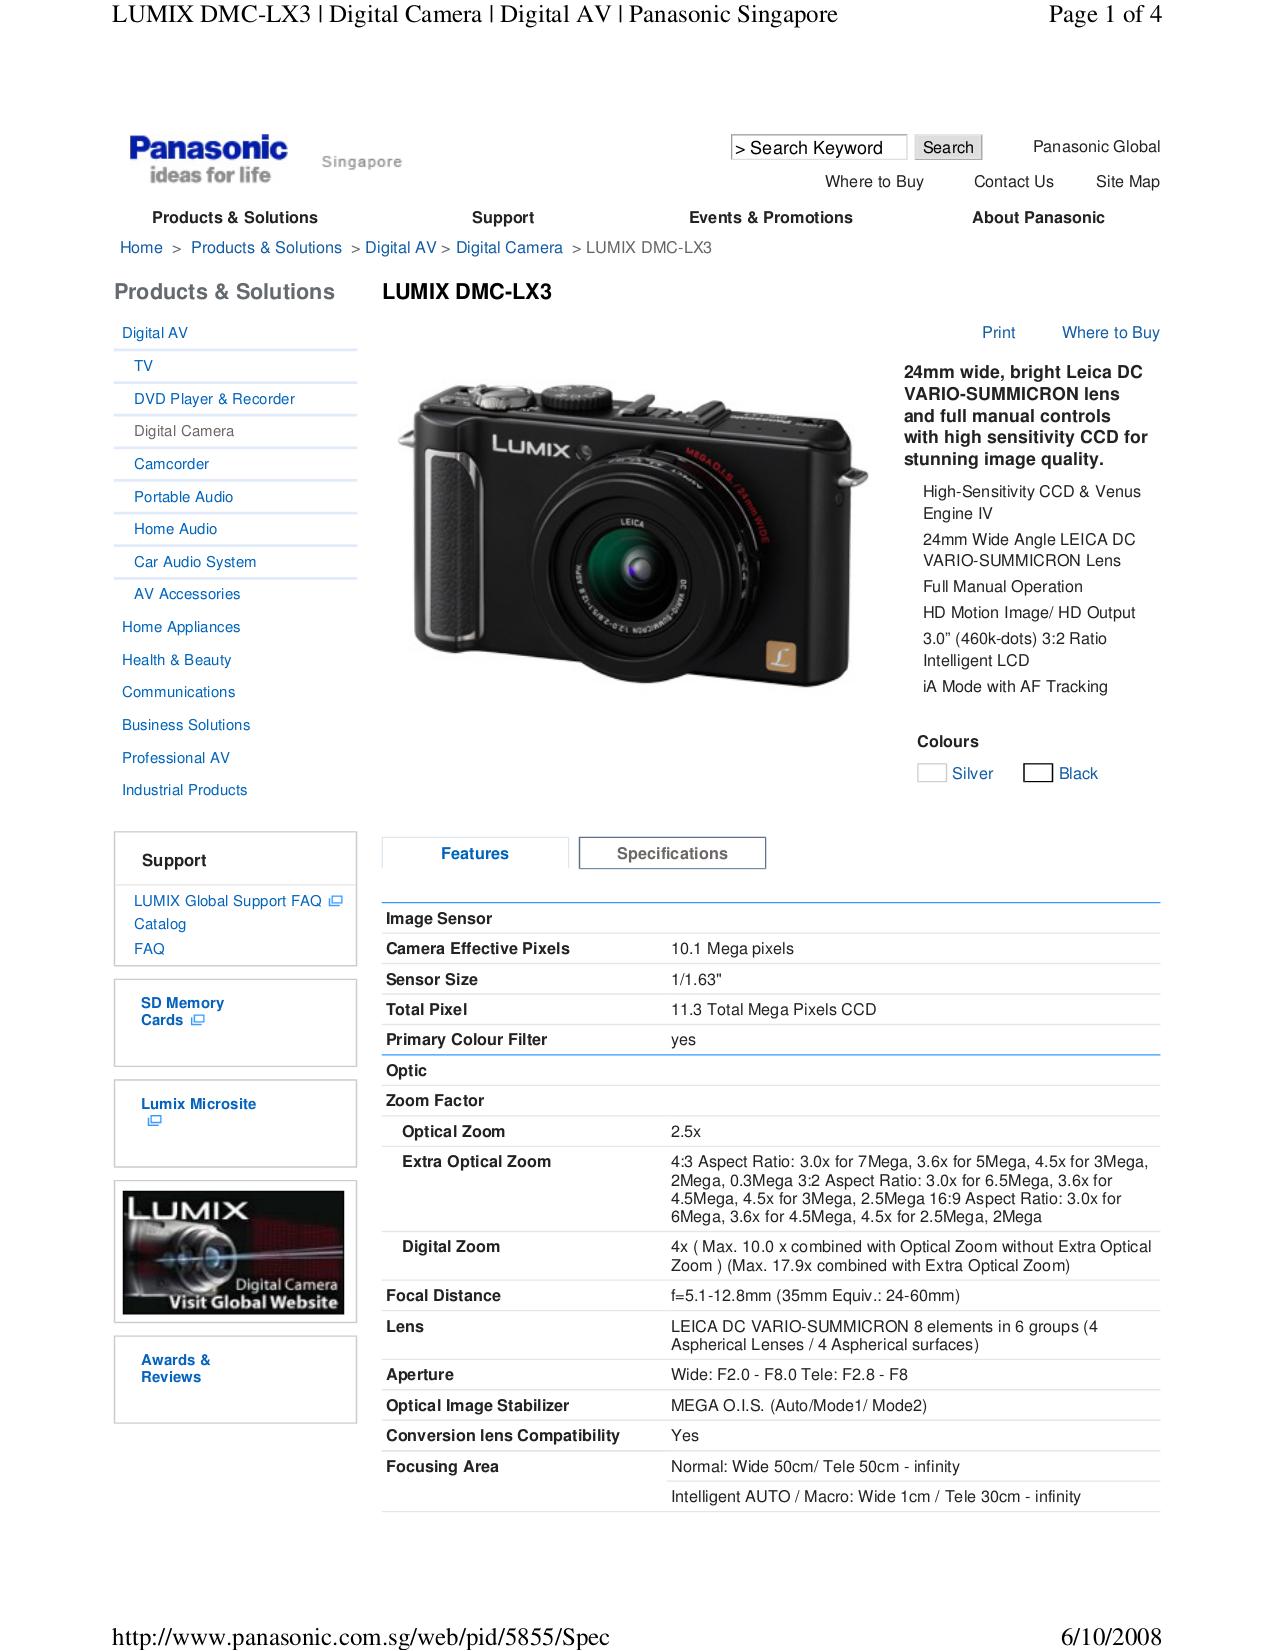 pdf for Panasonic Digital Camera Lumix DMC-LX3 manual